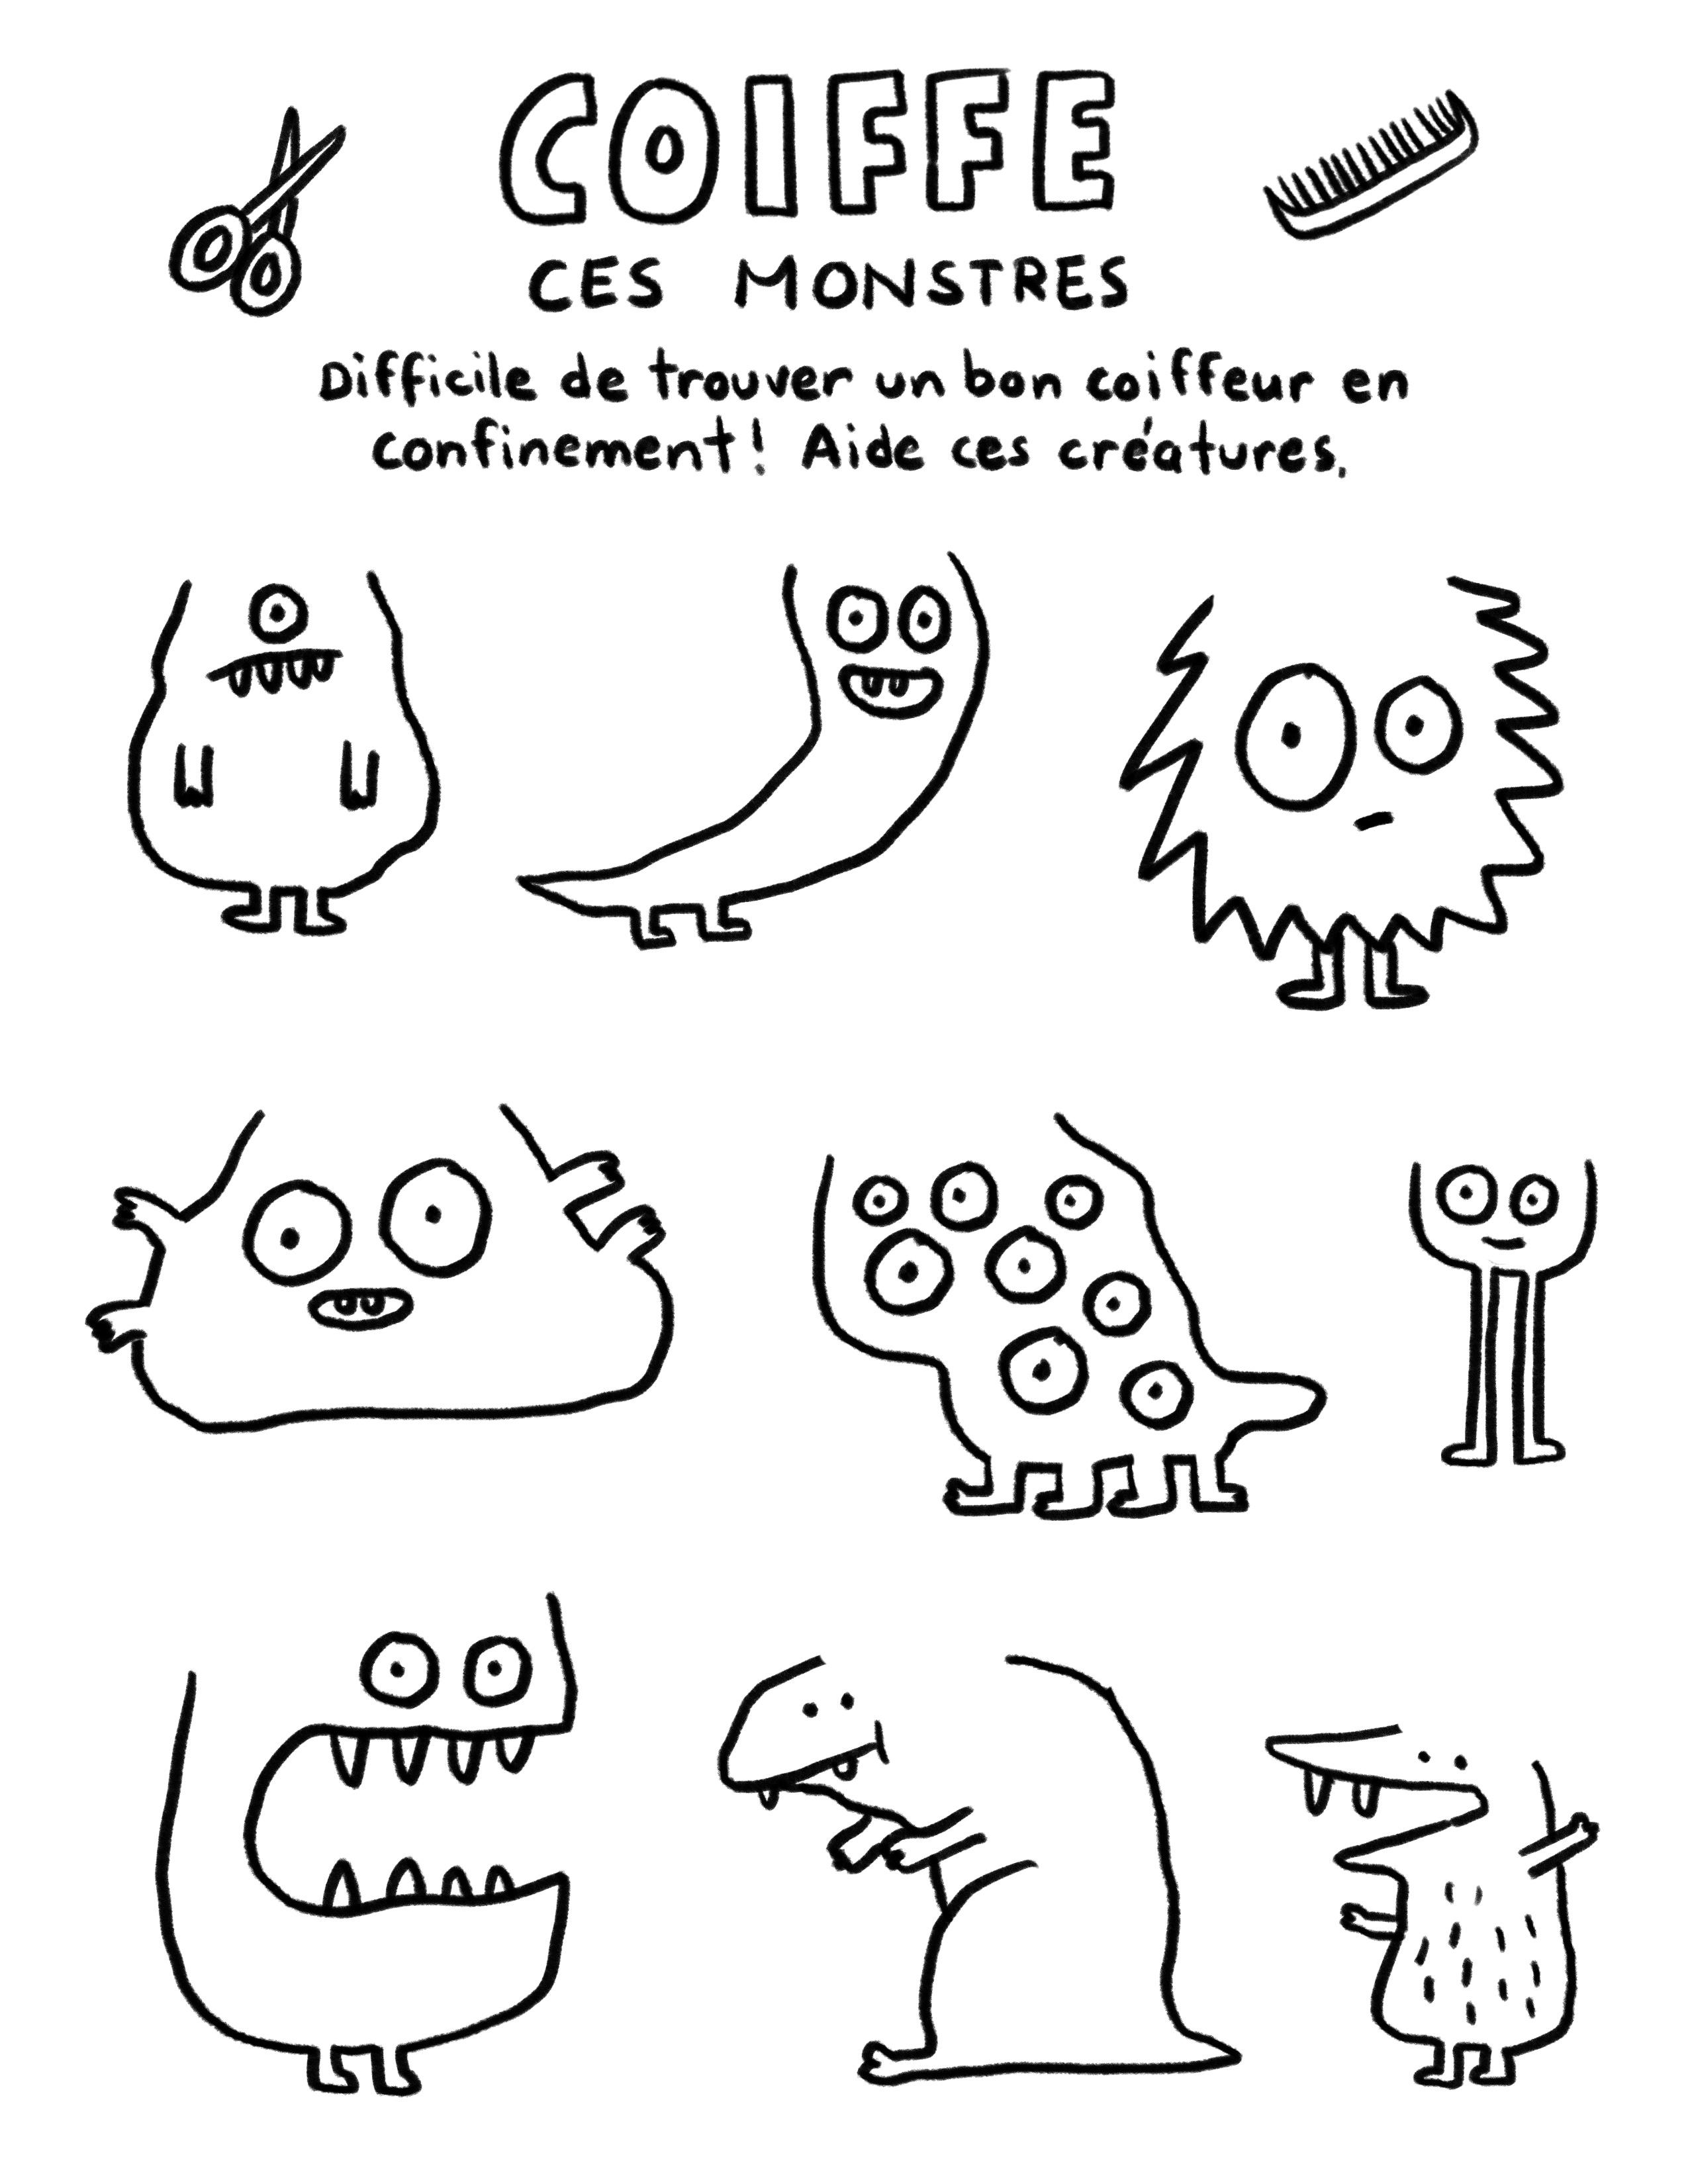 Coiffe ces monstres